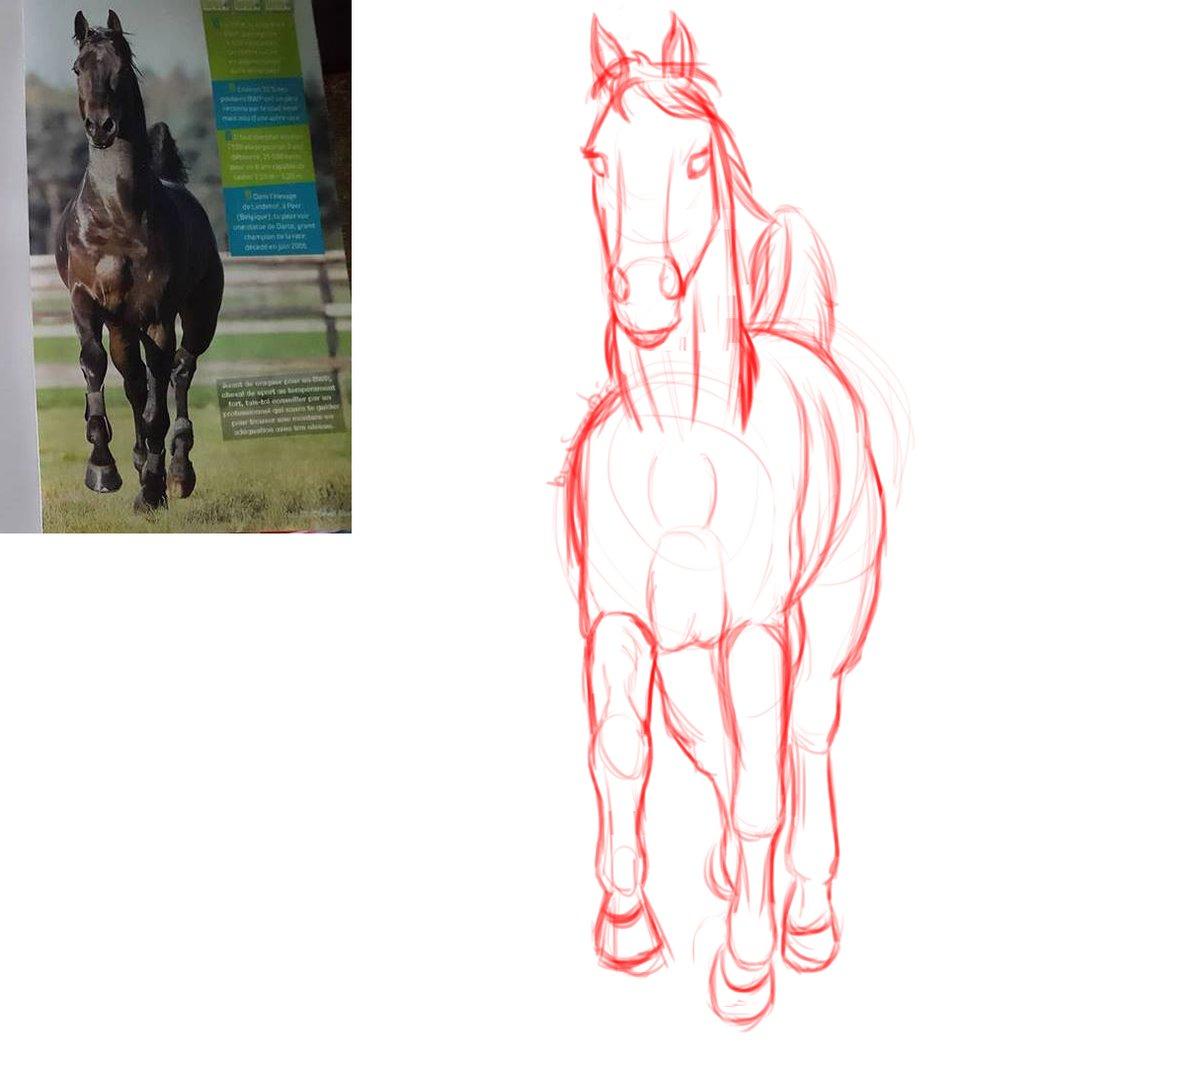 Dessin d'un cheval vu de face